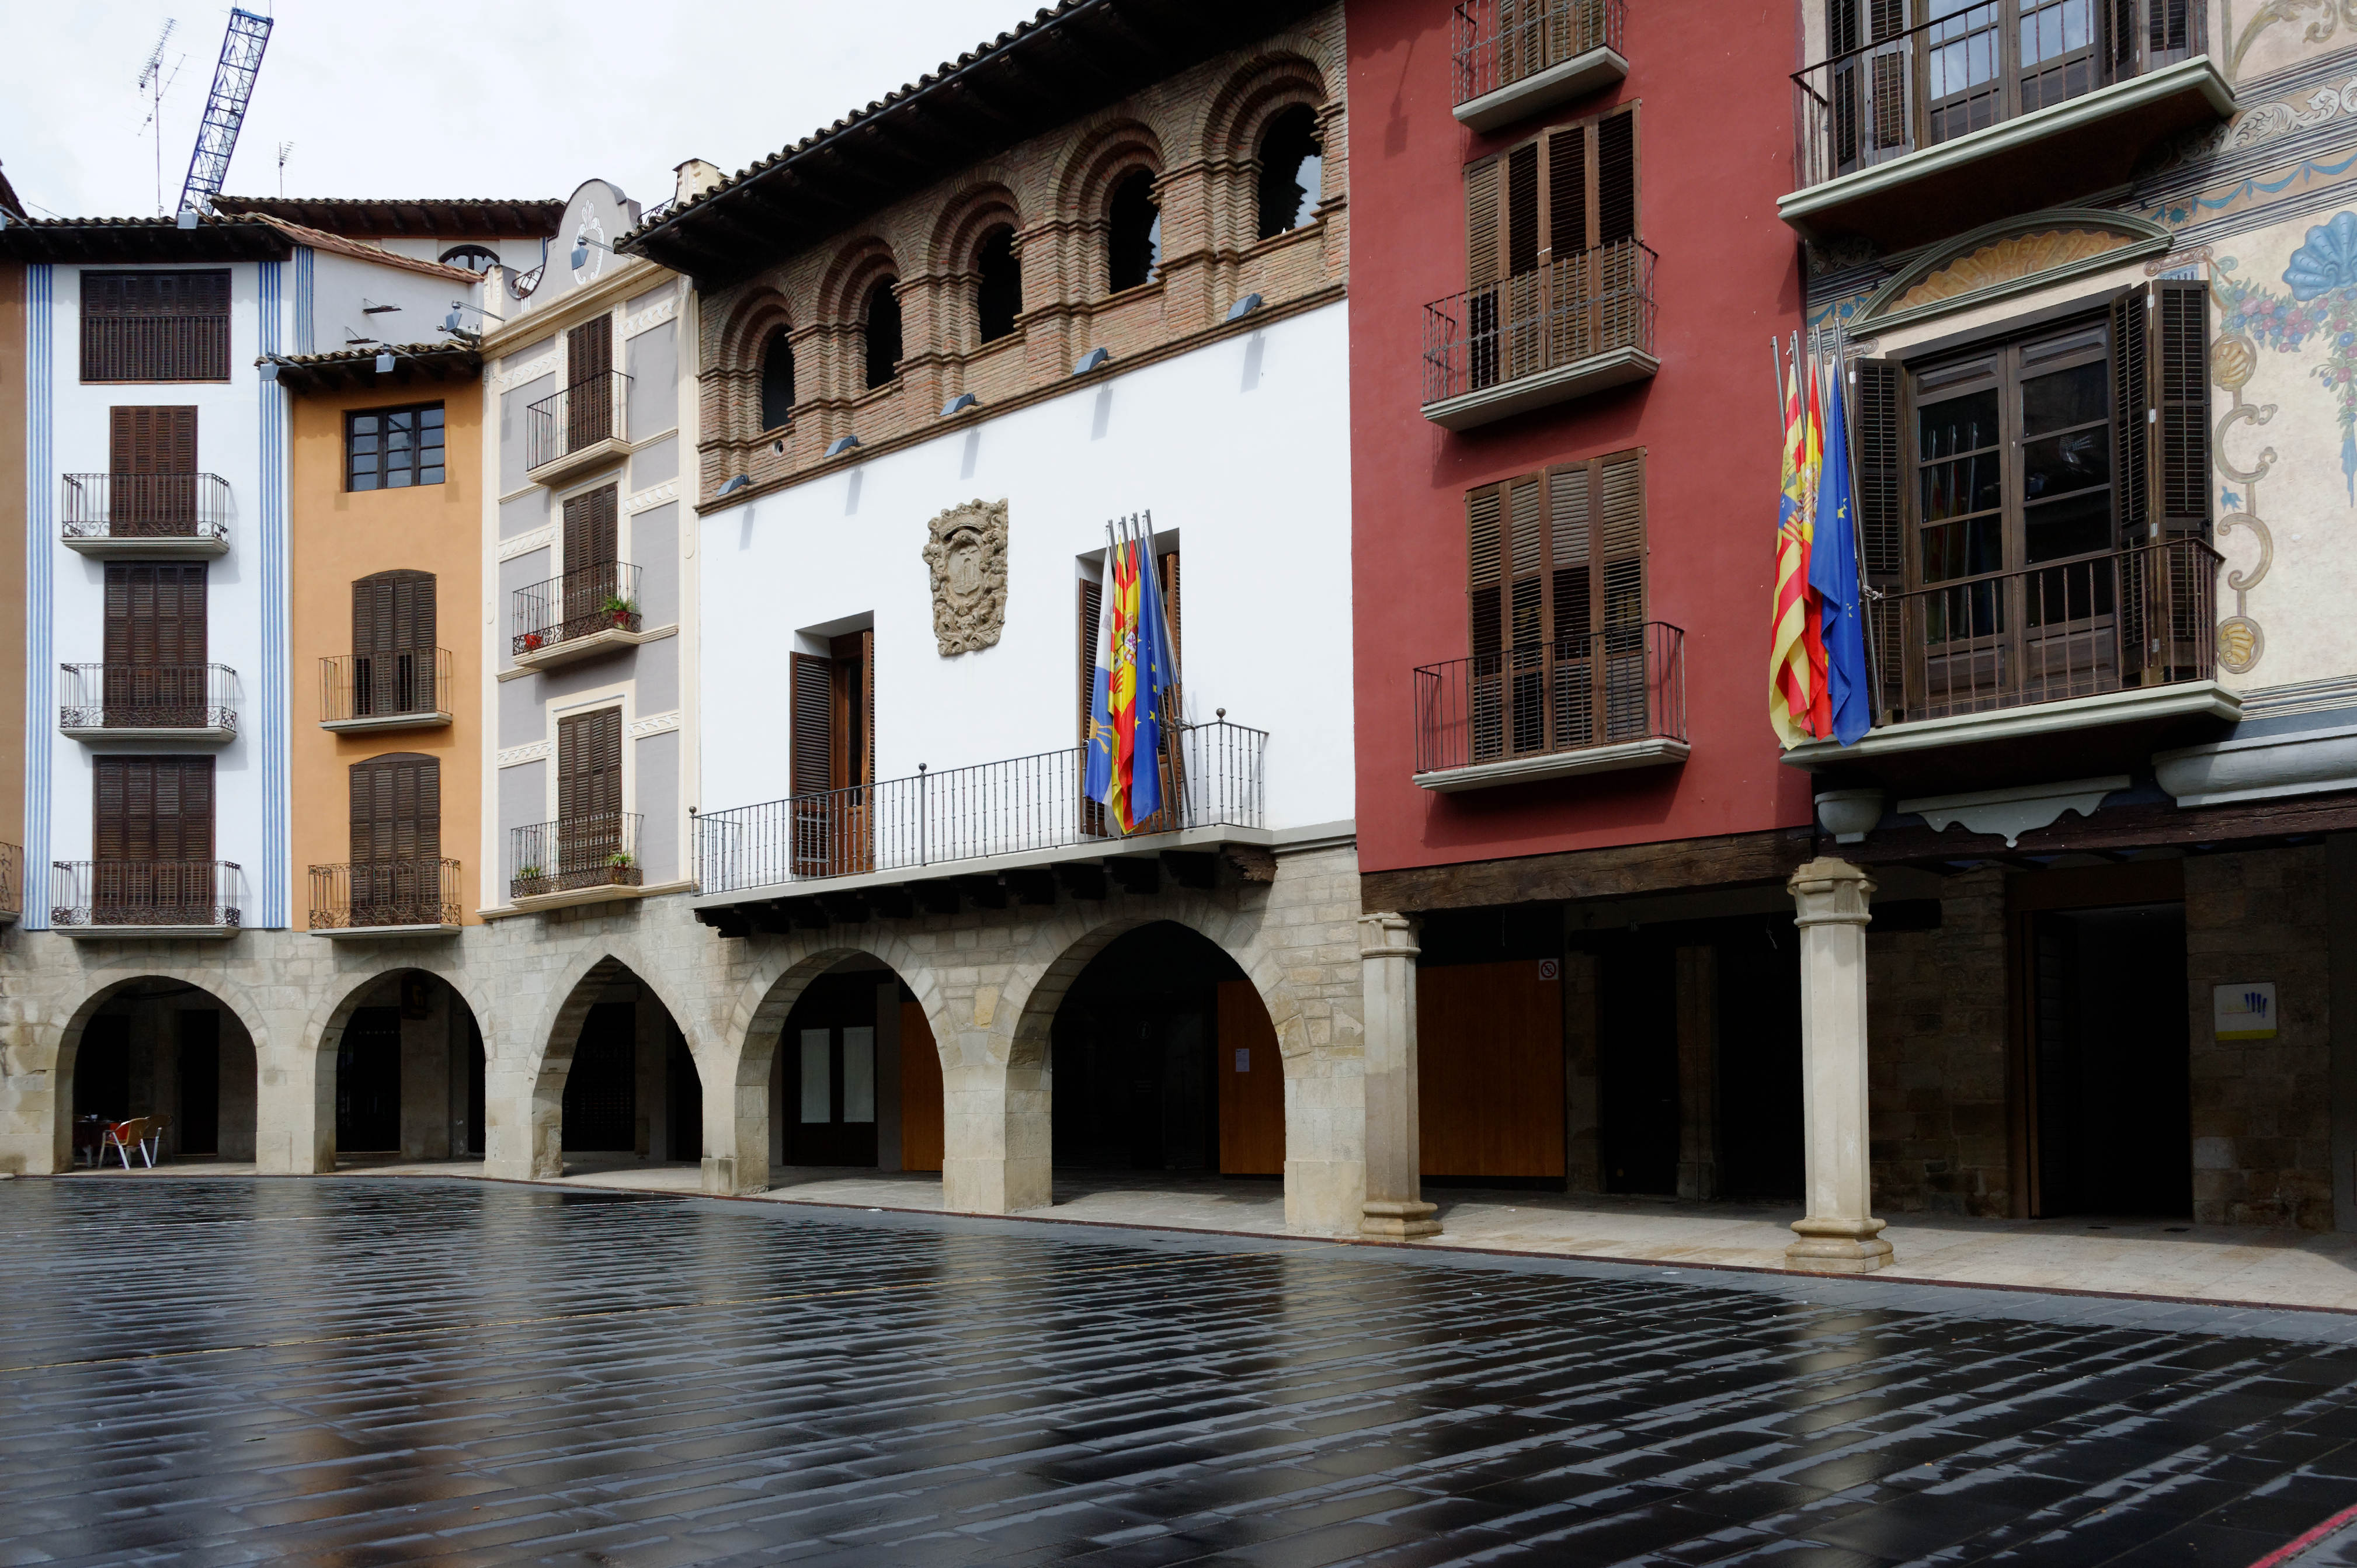 4317_Graus (Aragon)